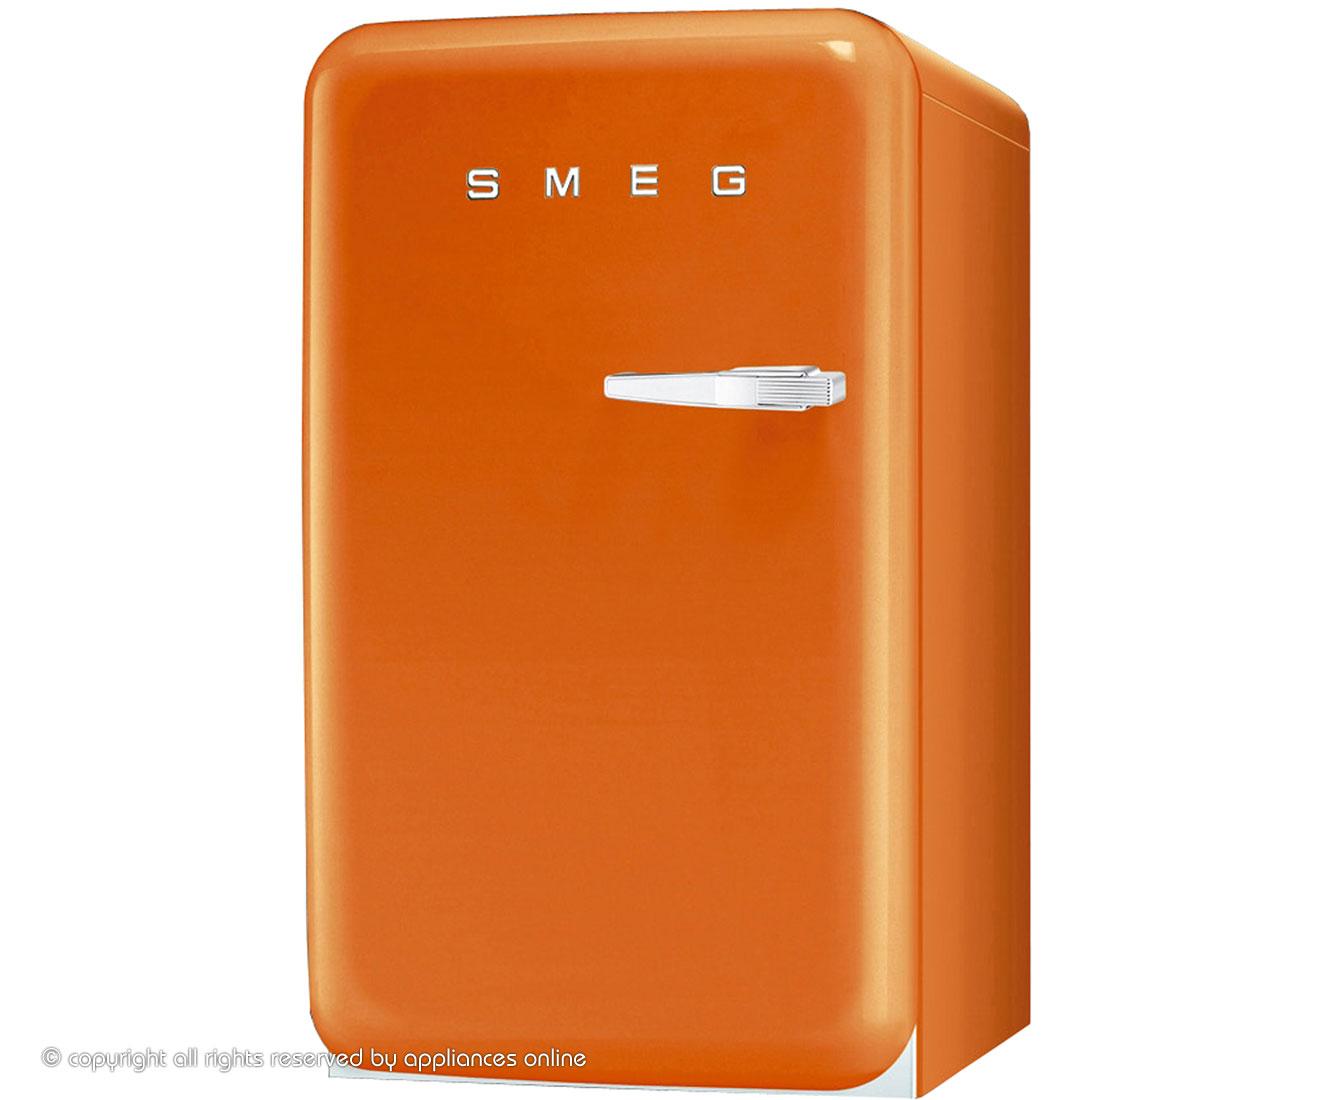 Smeg FAB10LO Fridge with Ice Box - Orange - A+ Rated